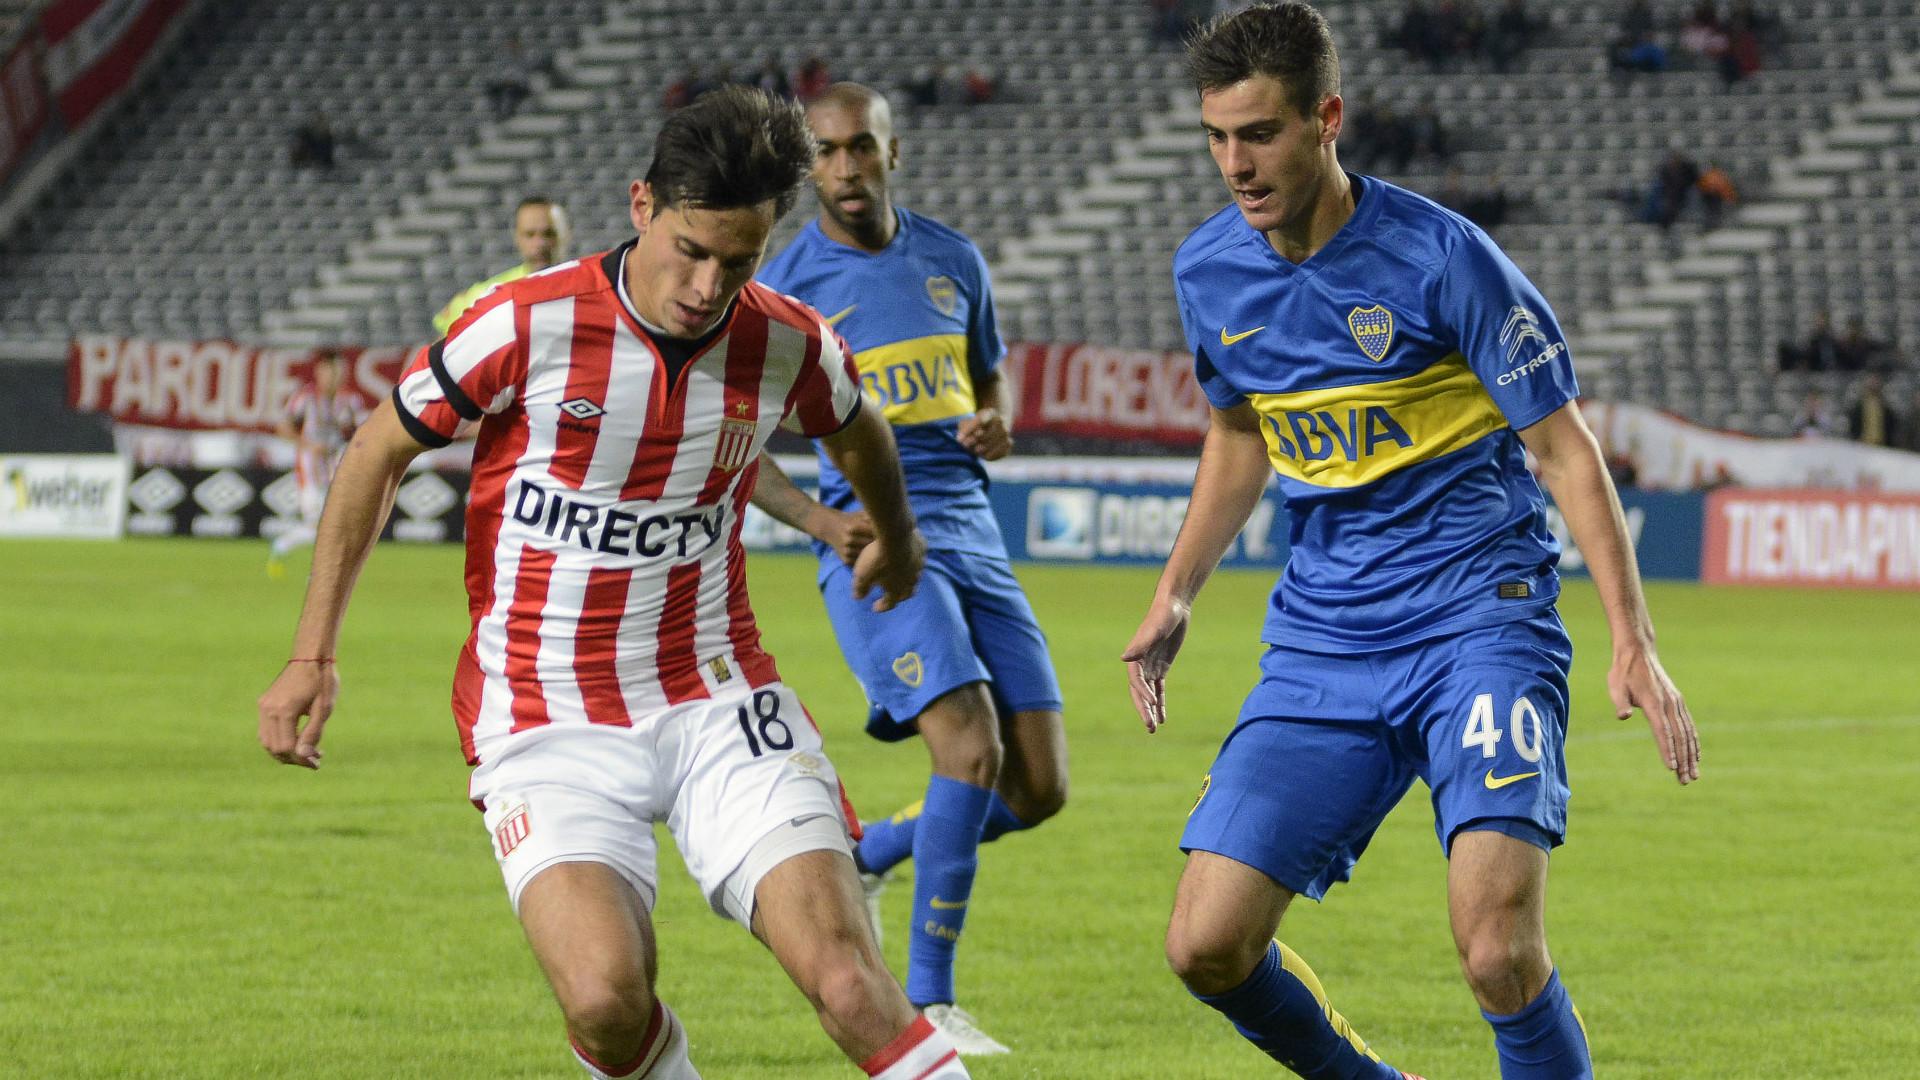 Chicco Cavallaro Estudiantes Boca Fecha 15 Campeonato Primera Division 15052016